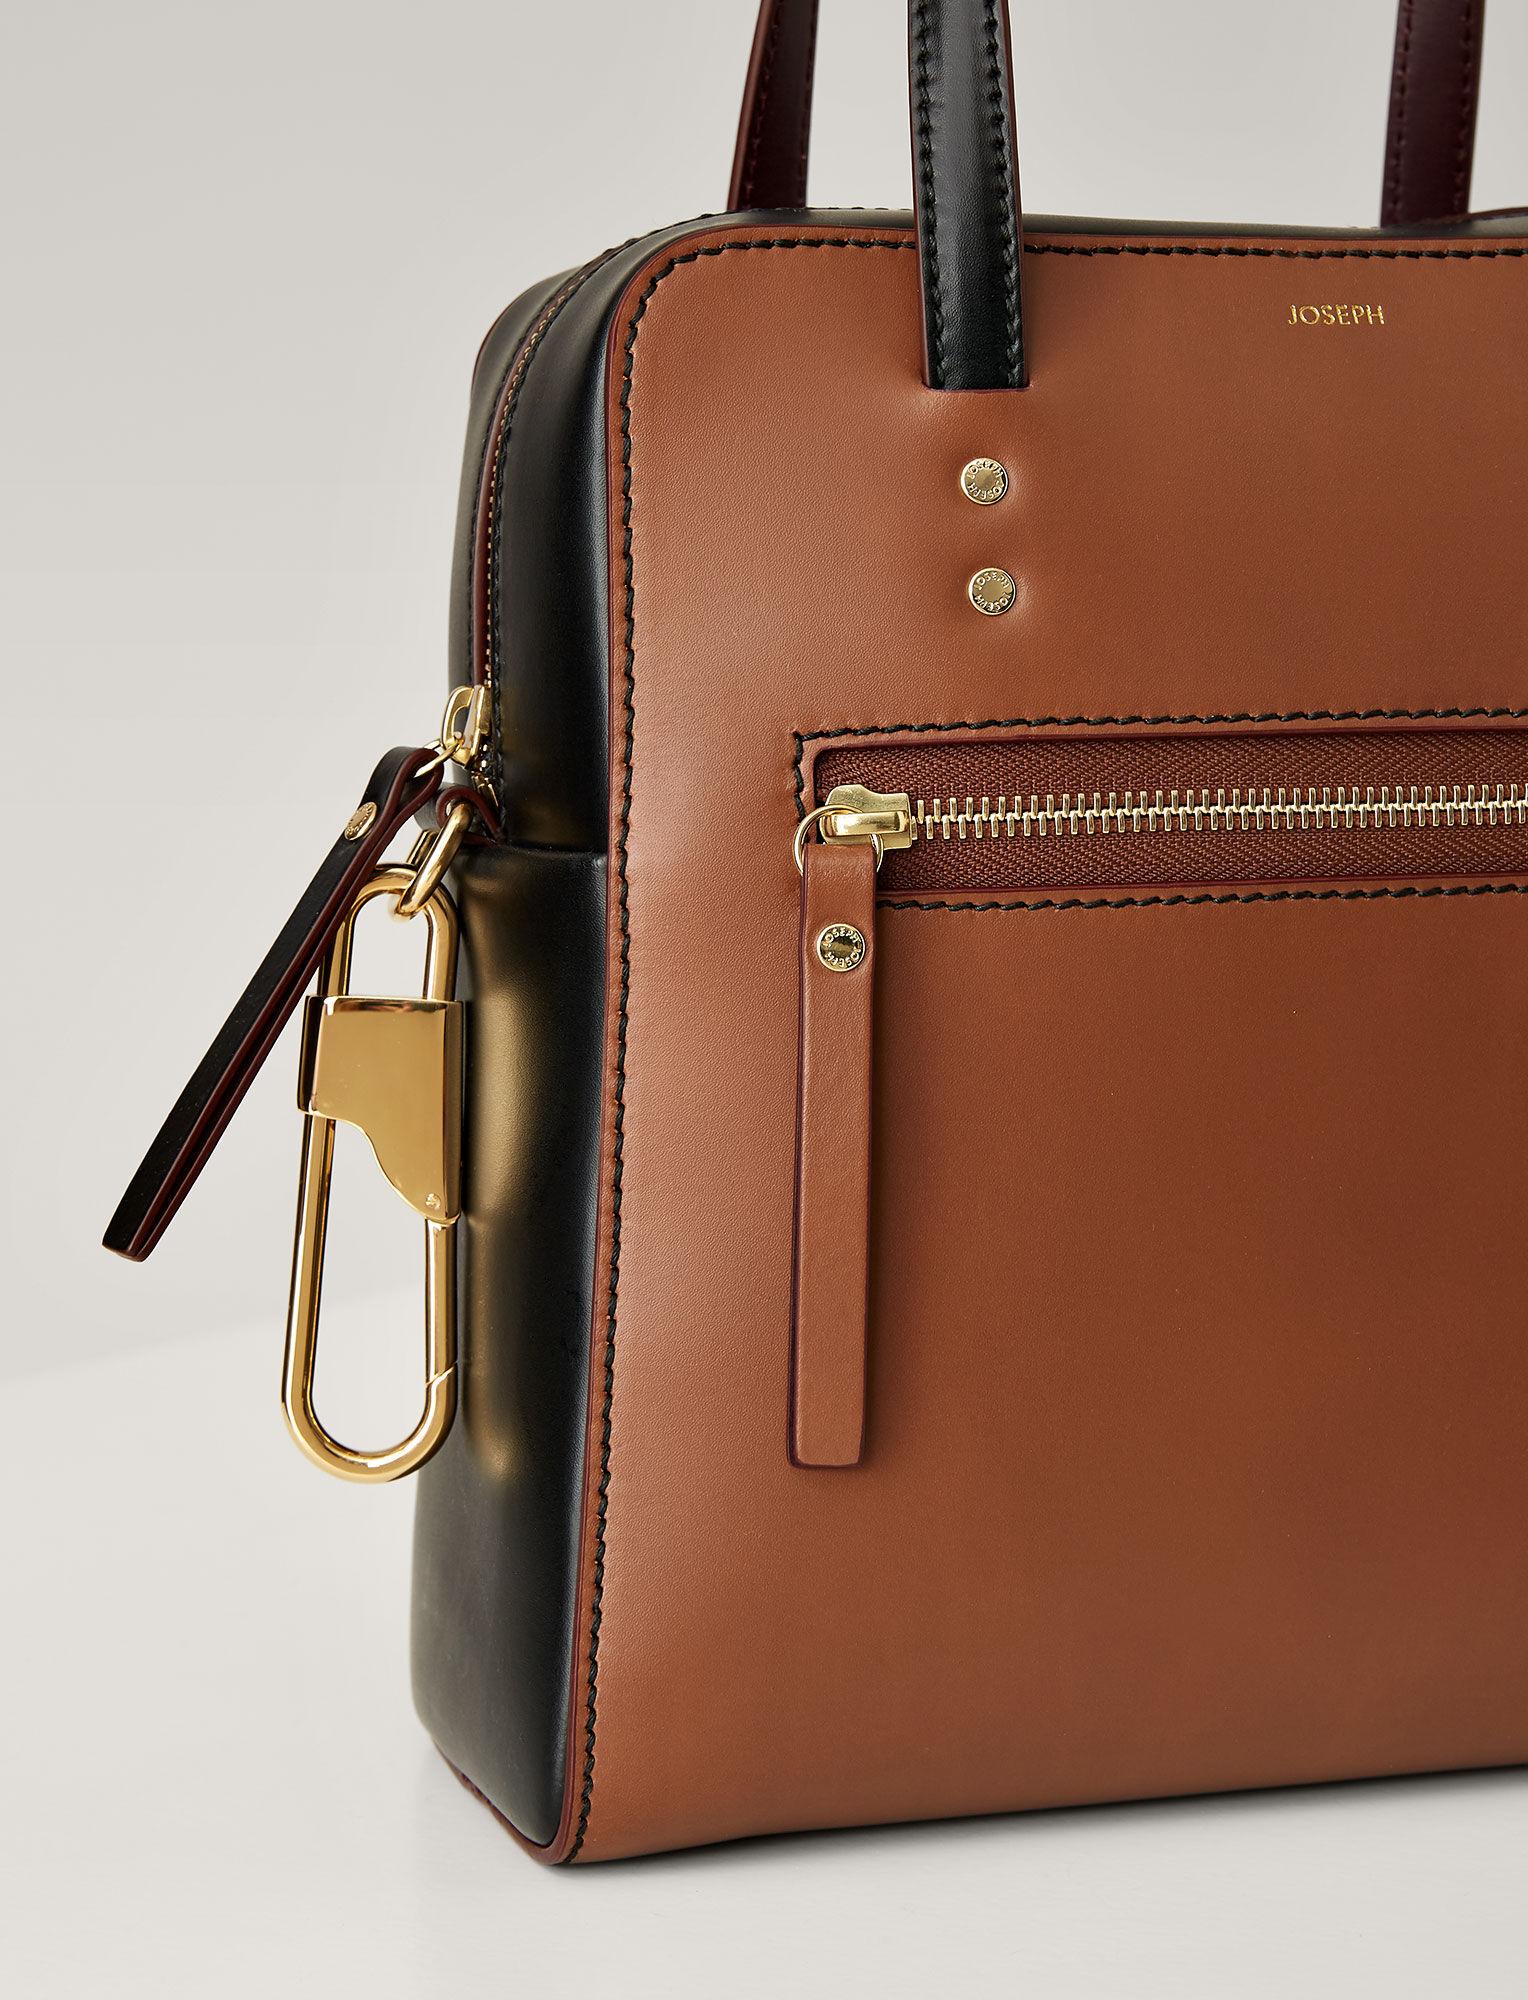 Joseph, Leather Ryder 25 Bag, in SADDLE